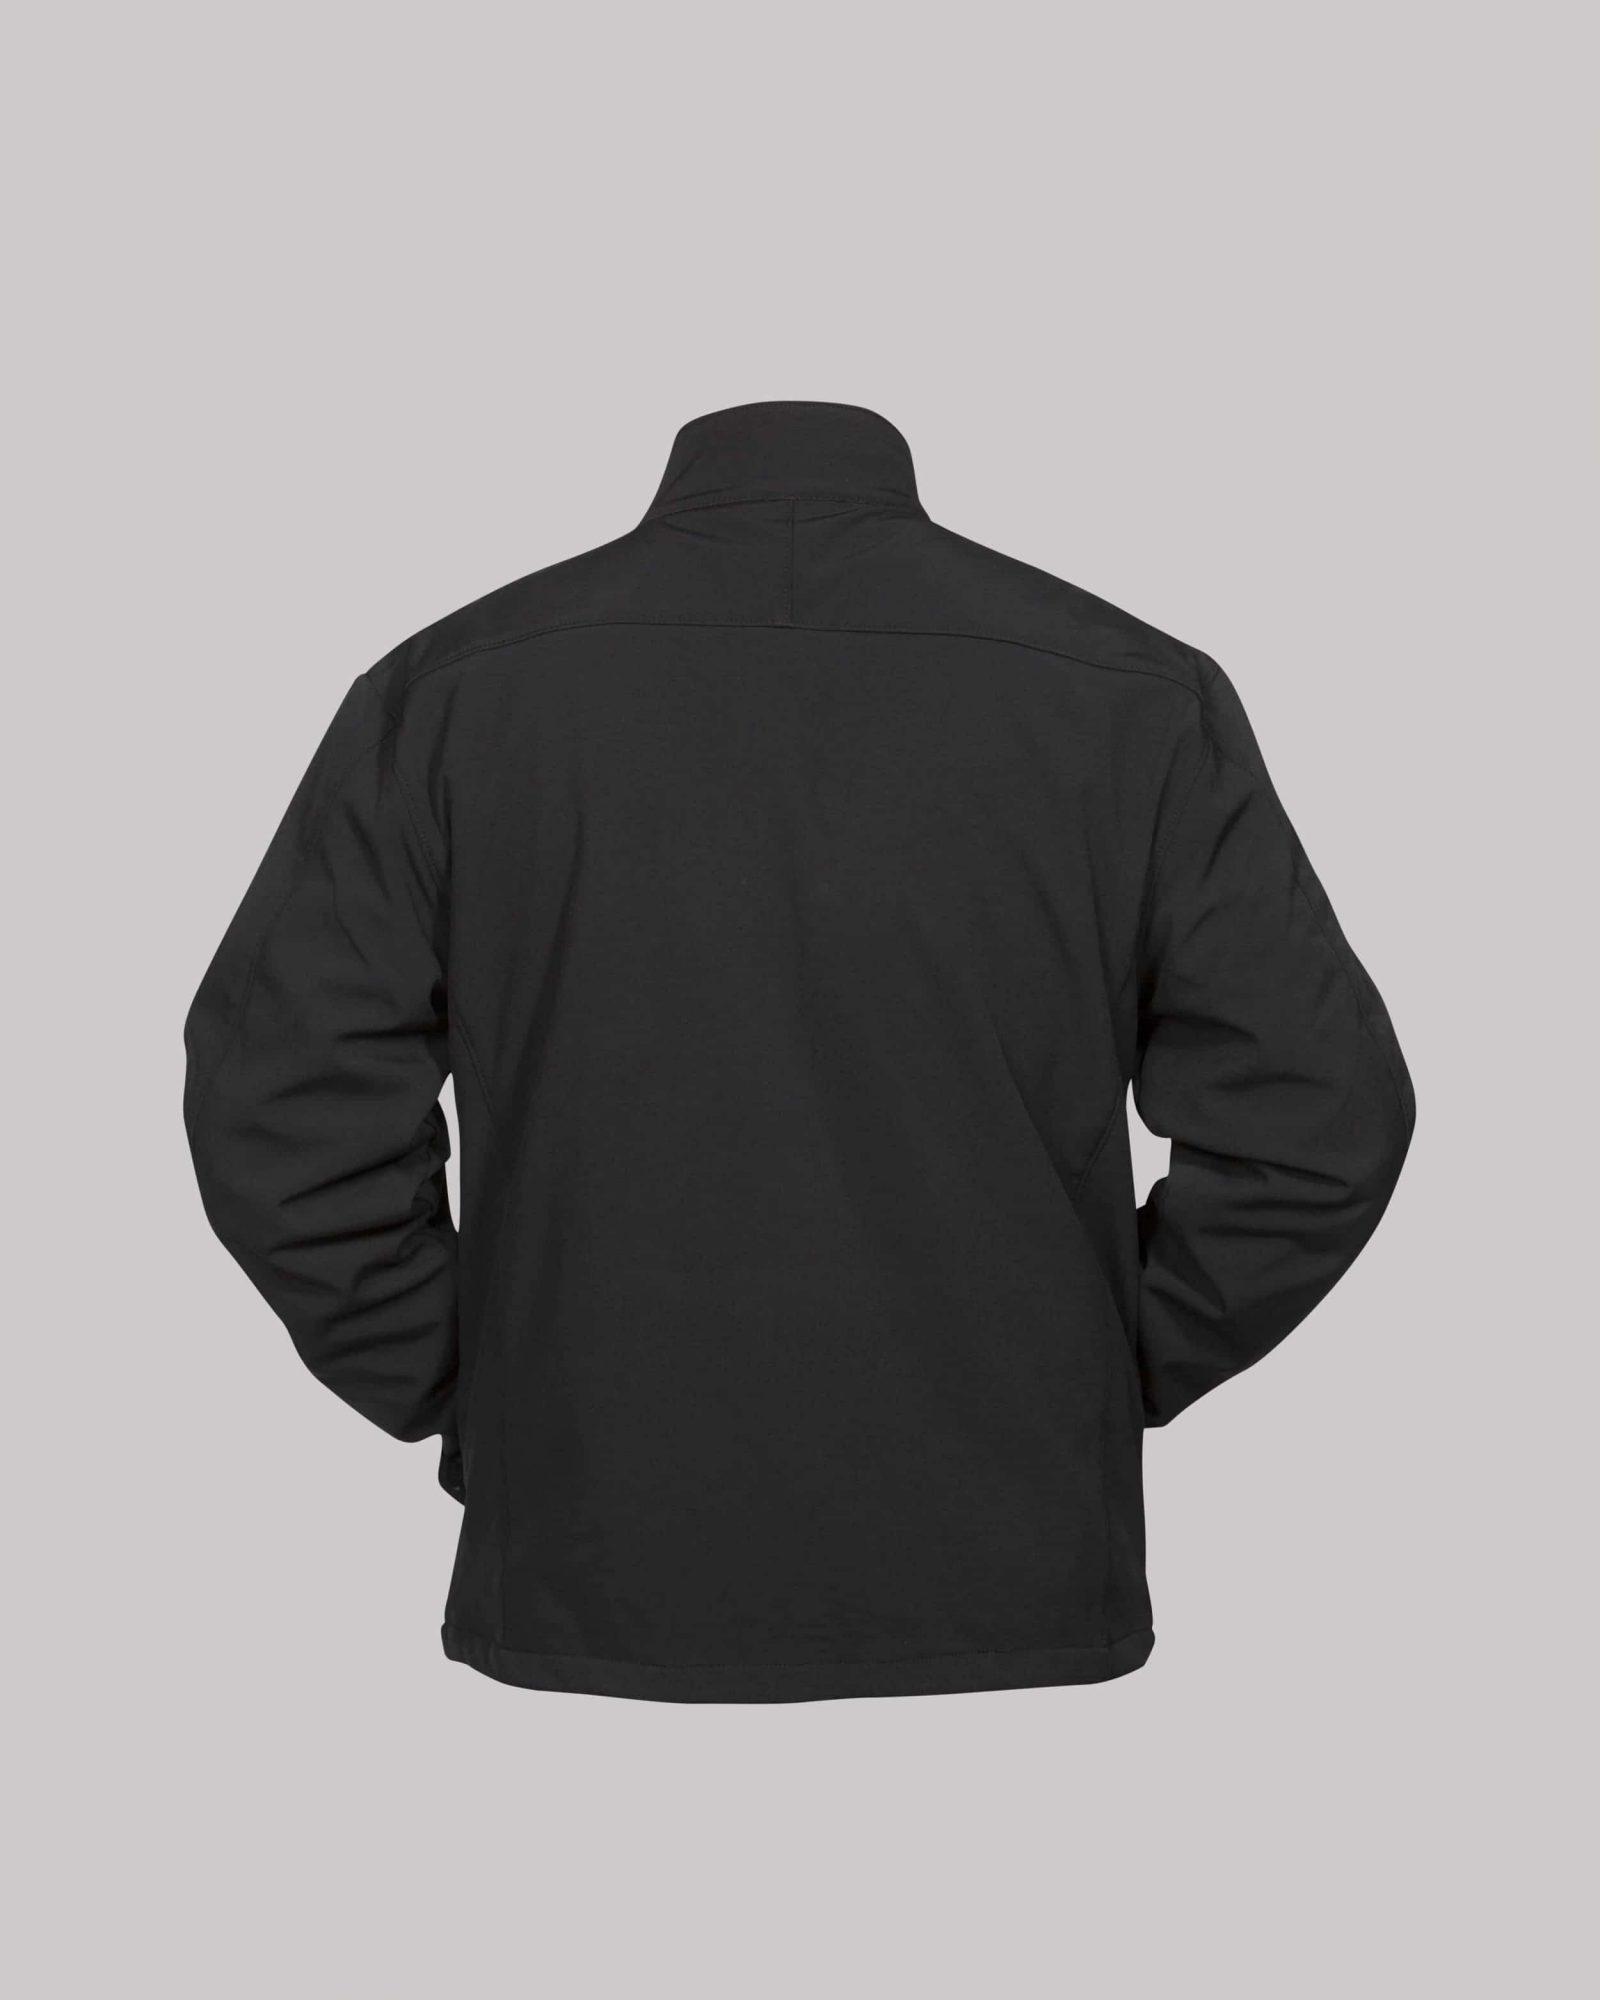 Waist Length Casual Microfiber Jacket